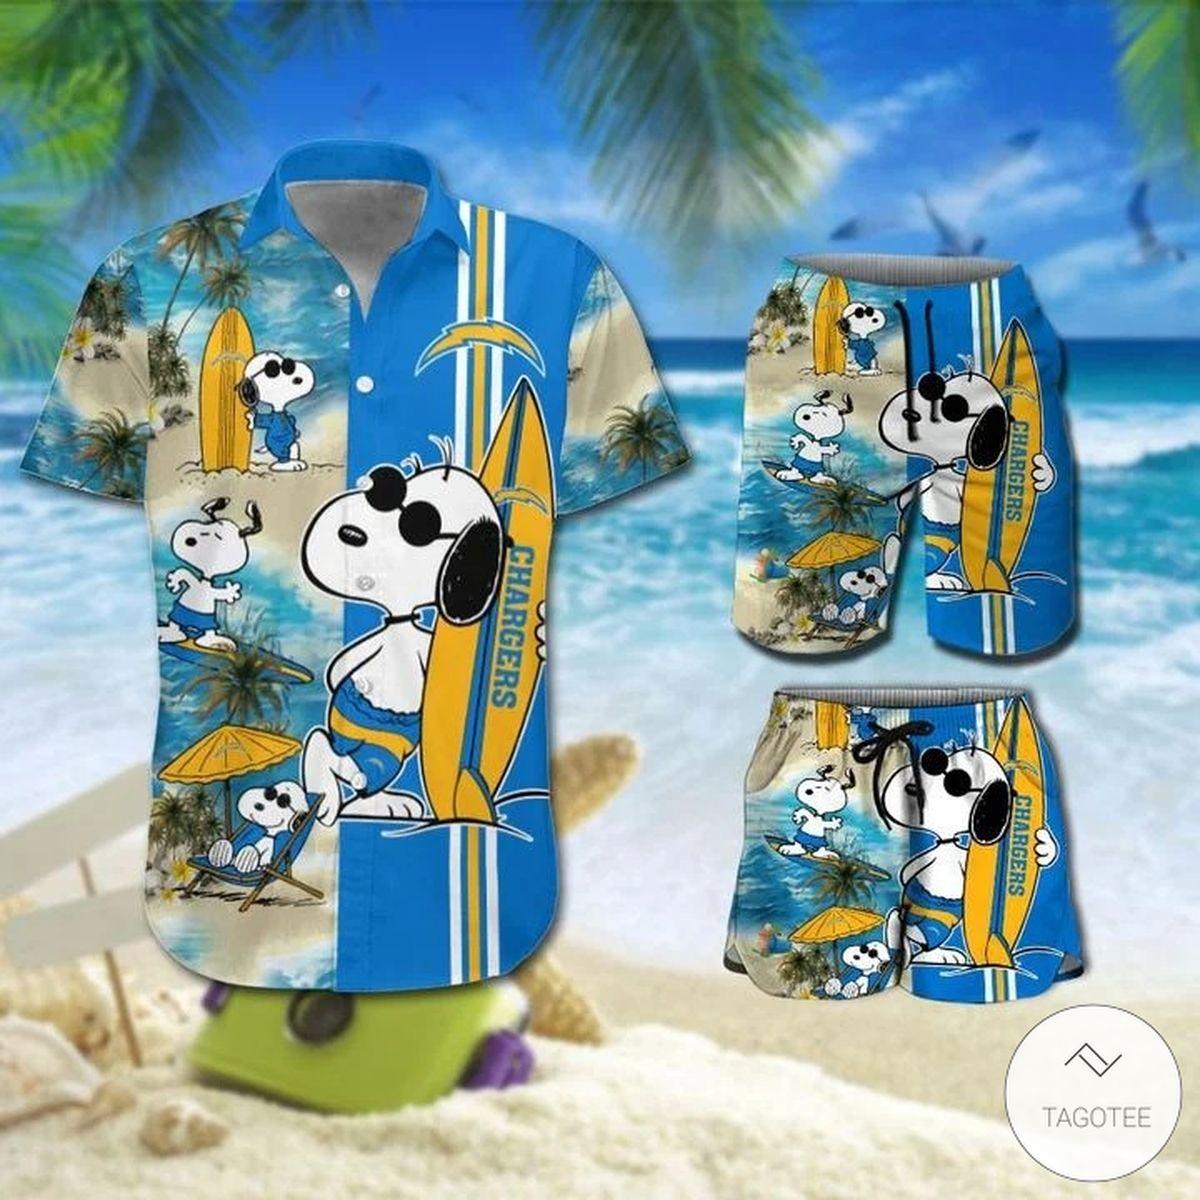 Snoopy And Los Angeles Chargers Hawaiian Shirt, Beach Shorts